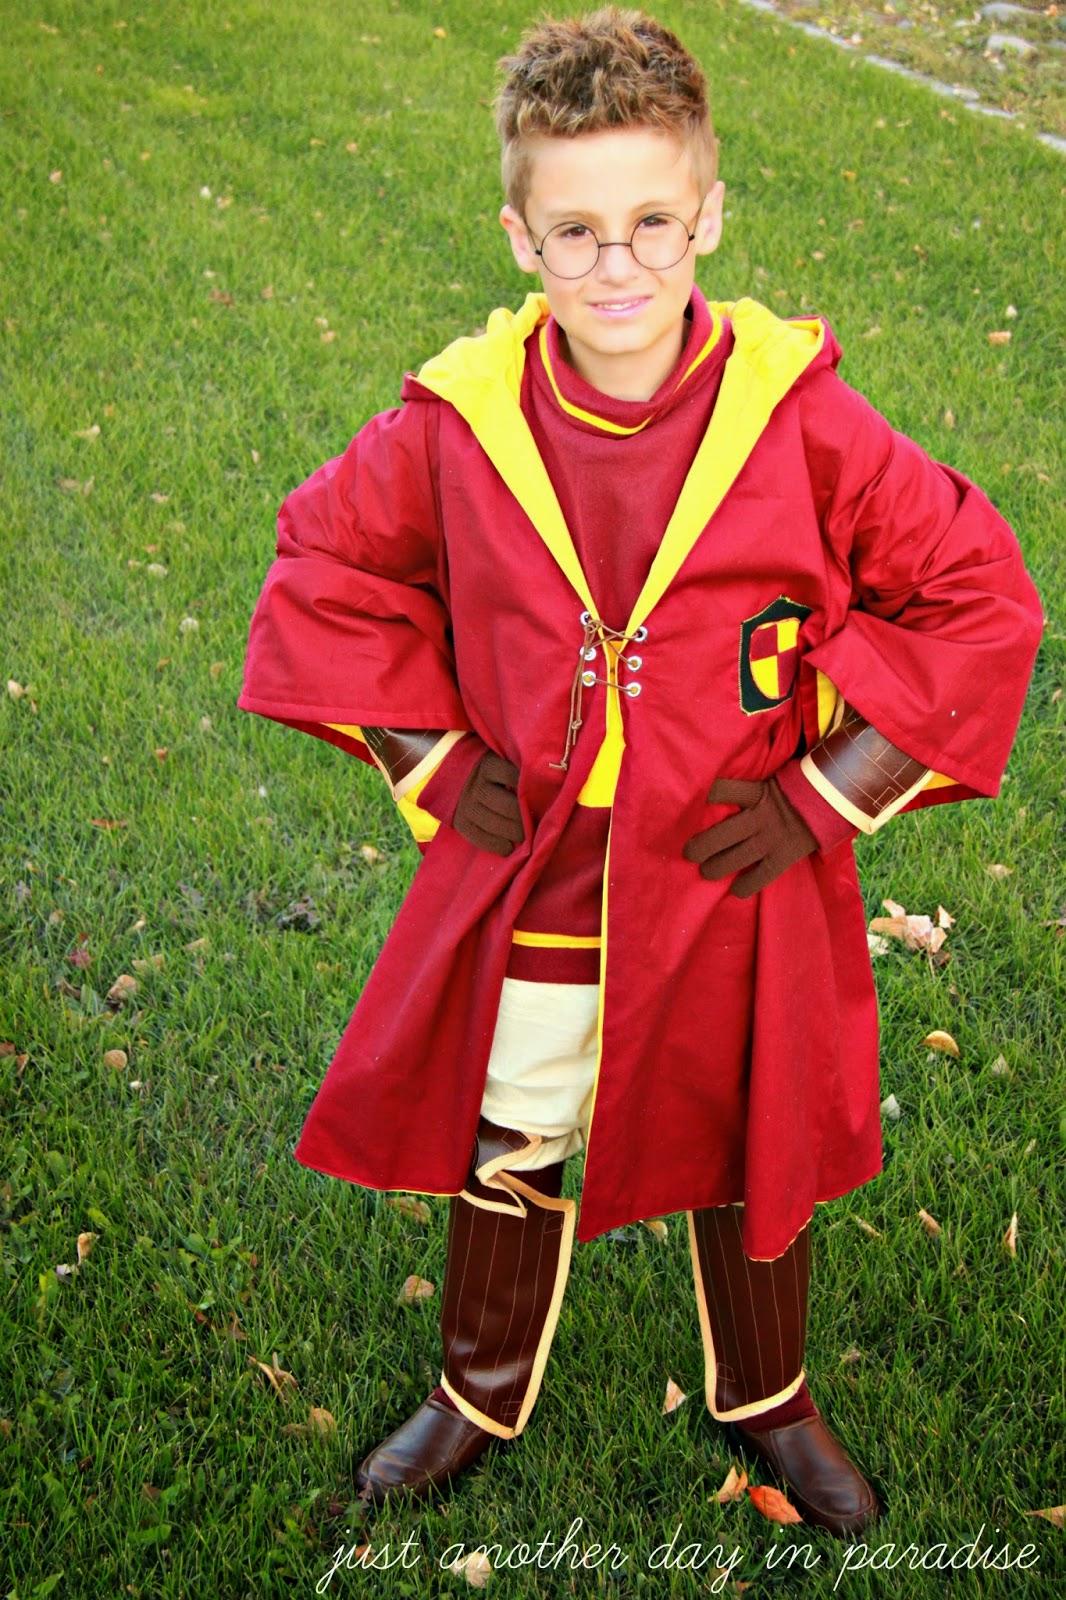 quidditch Harry costume potter